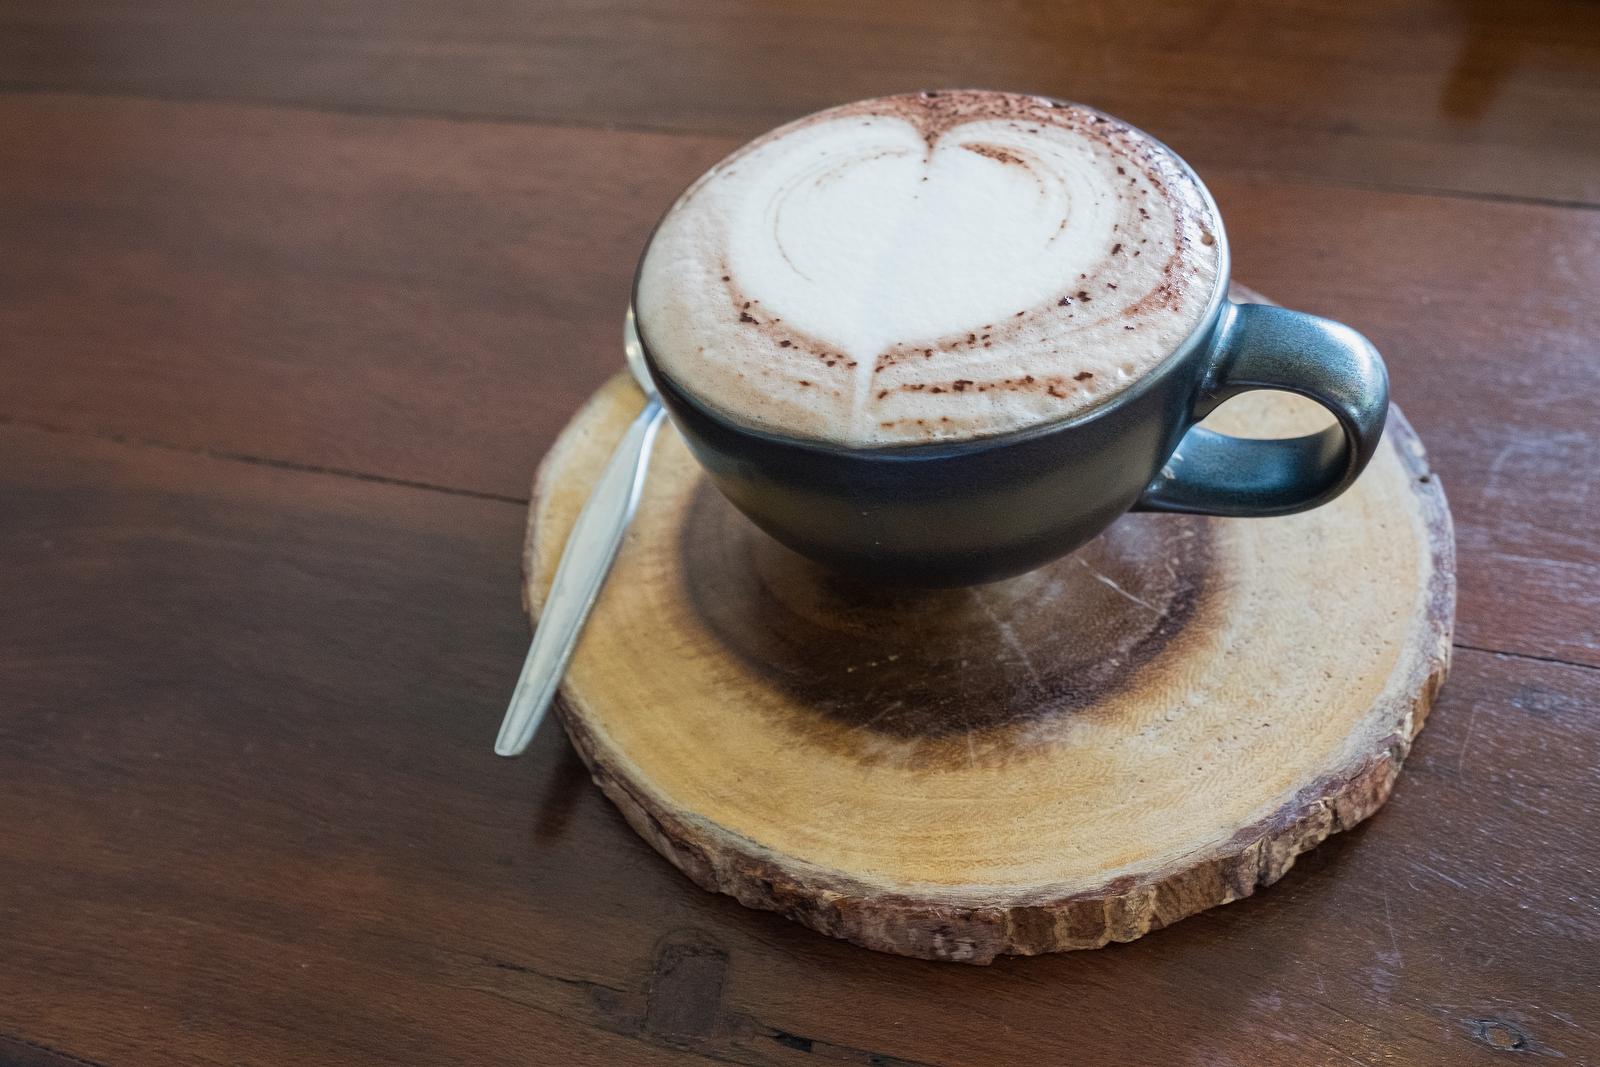 Kaffee - Motiv im Schaum - Trends 2016